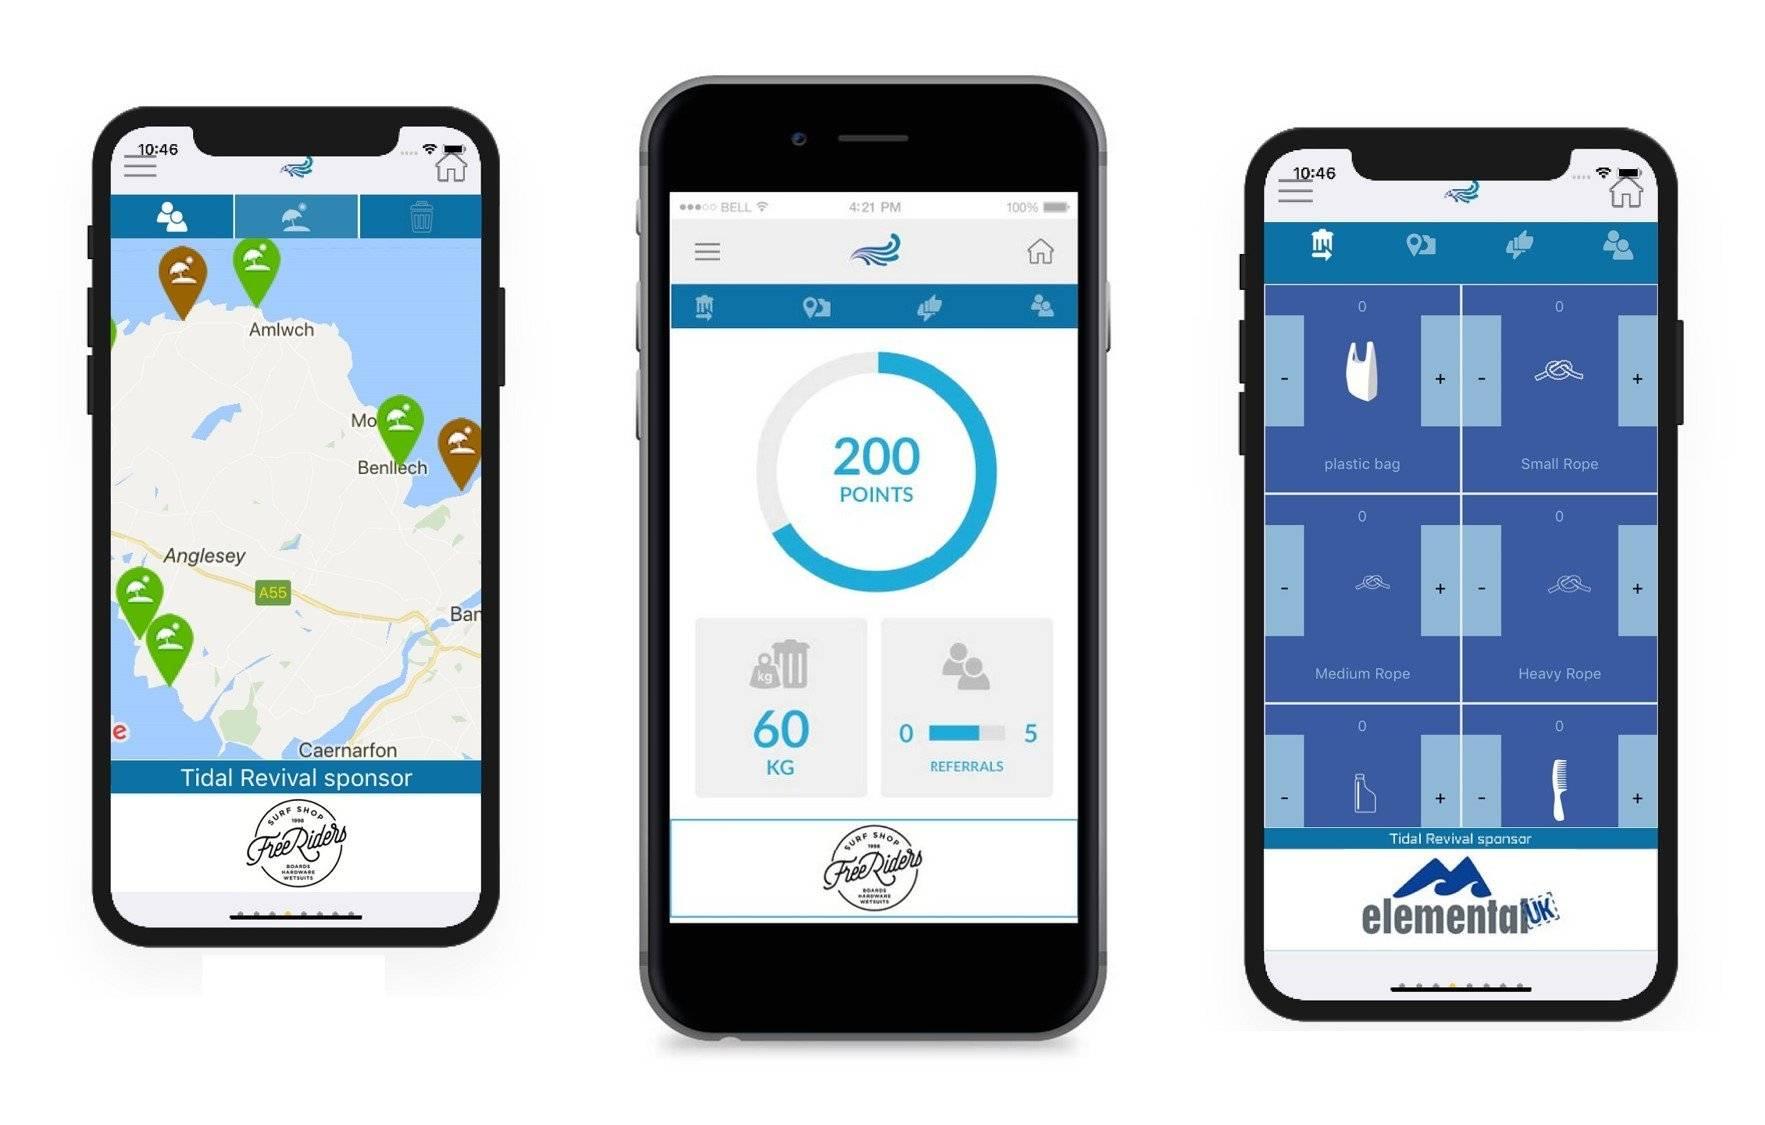 The tidal revival app